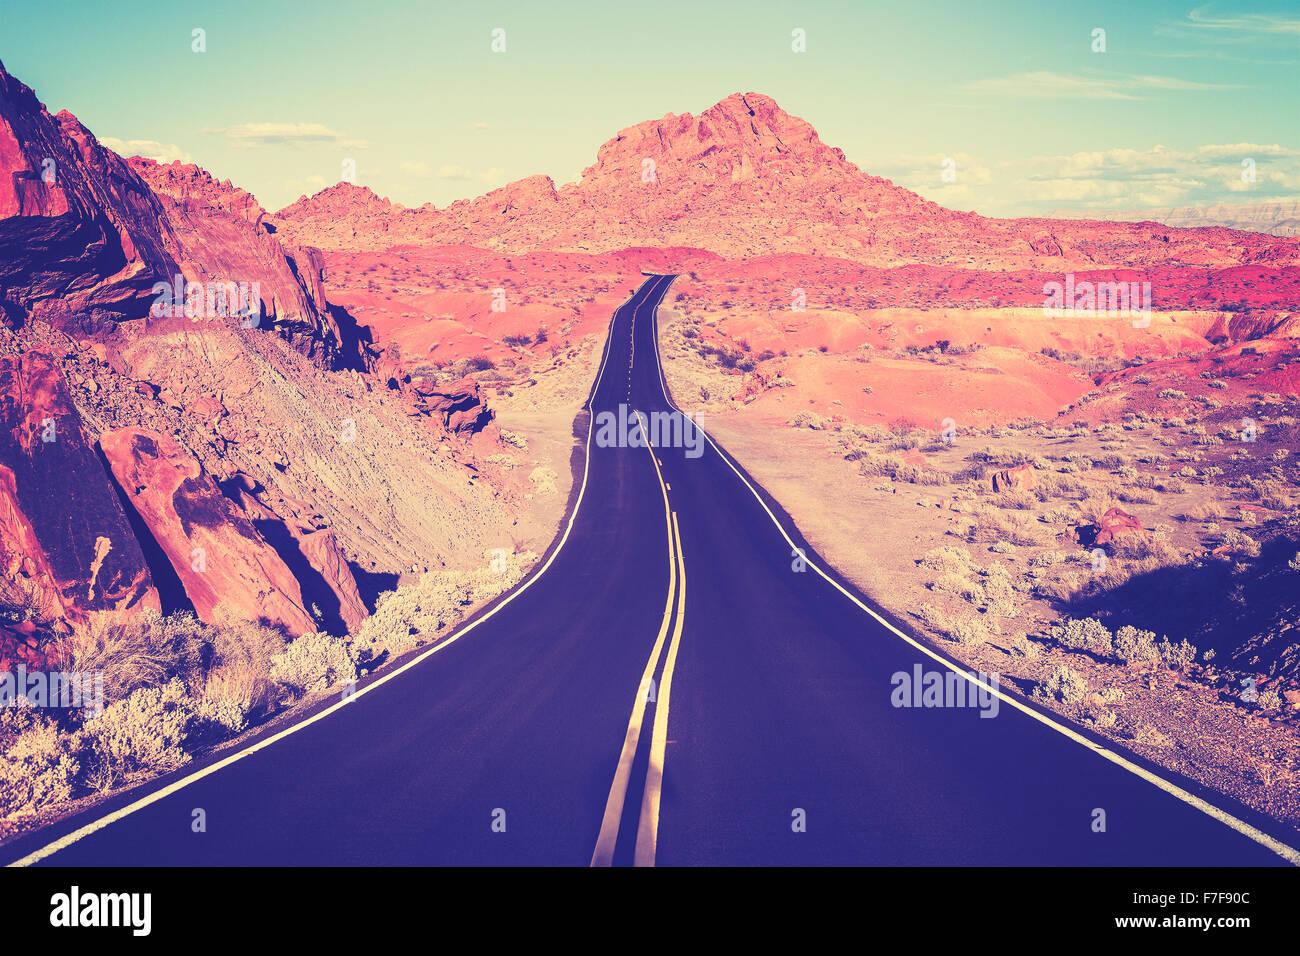 Vintage getönten gebogene Wüste Autobahn, Reisekonzept, USA. Stockbild